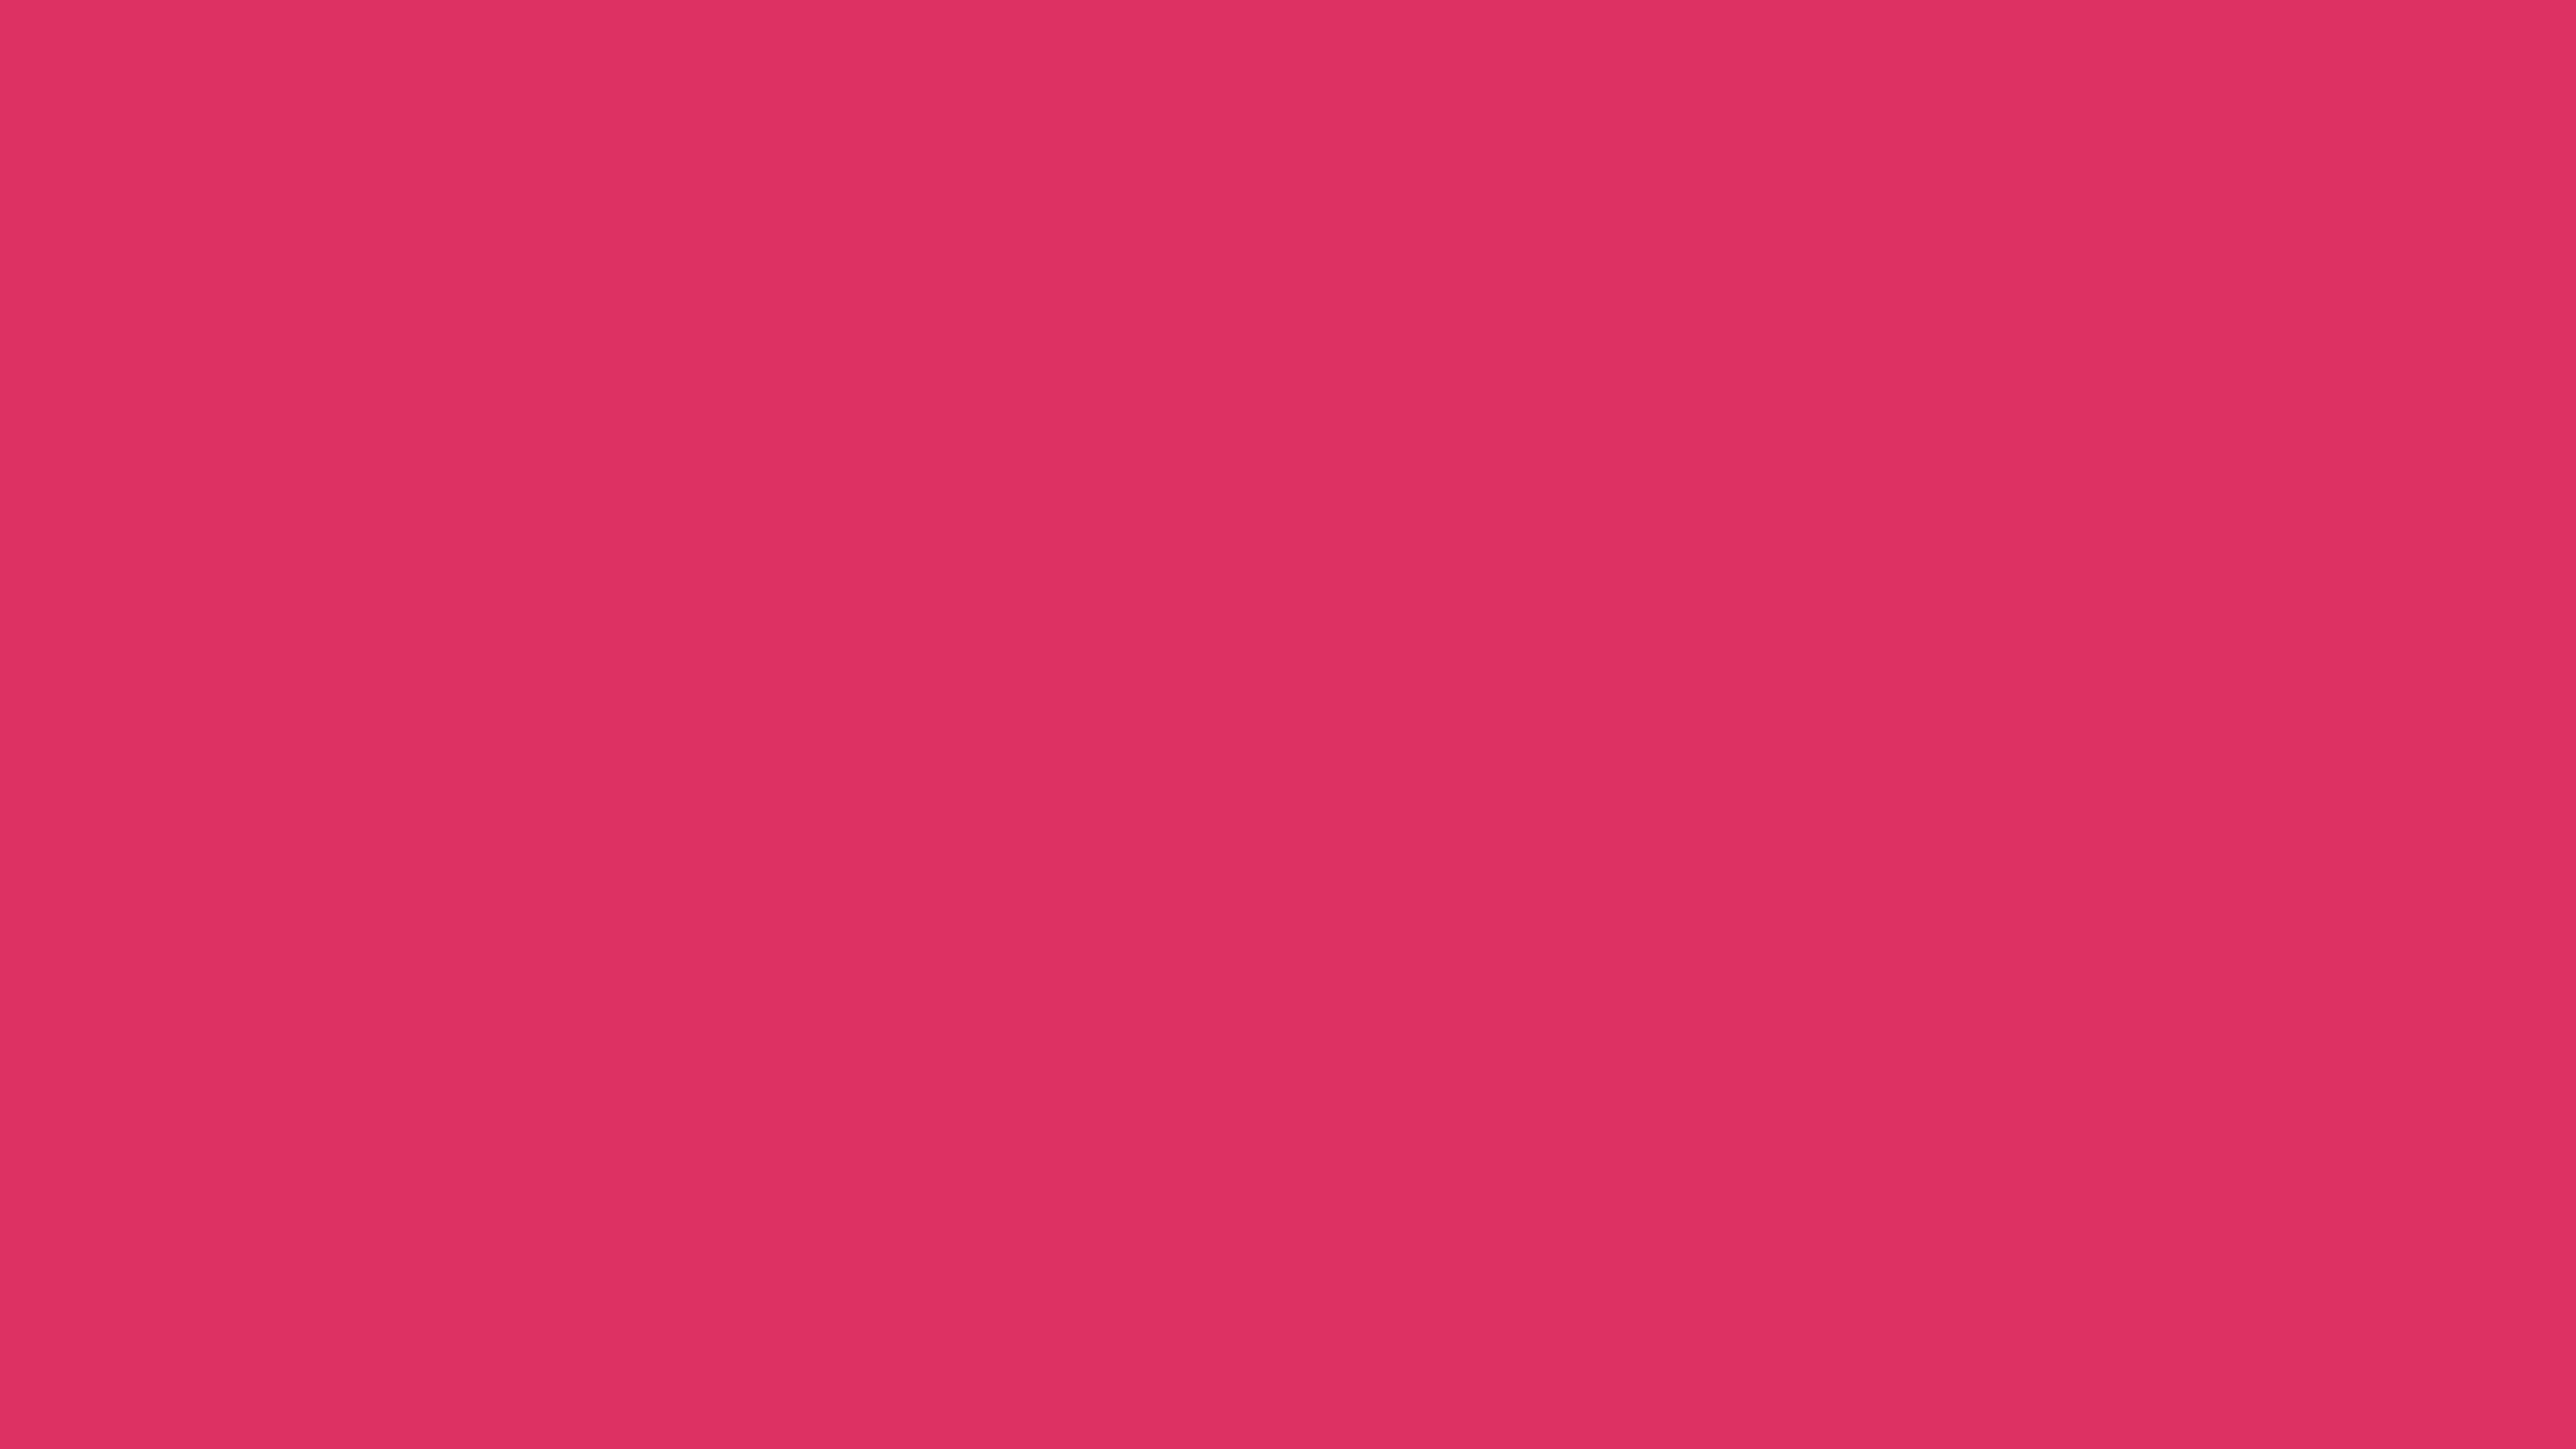 4096x2304 Cerise Solid Color Background